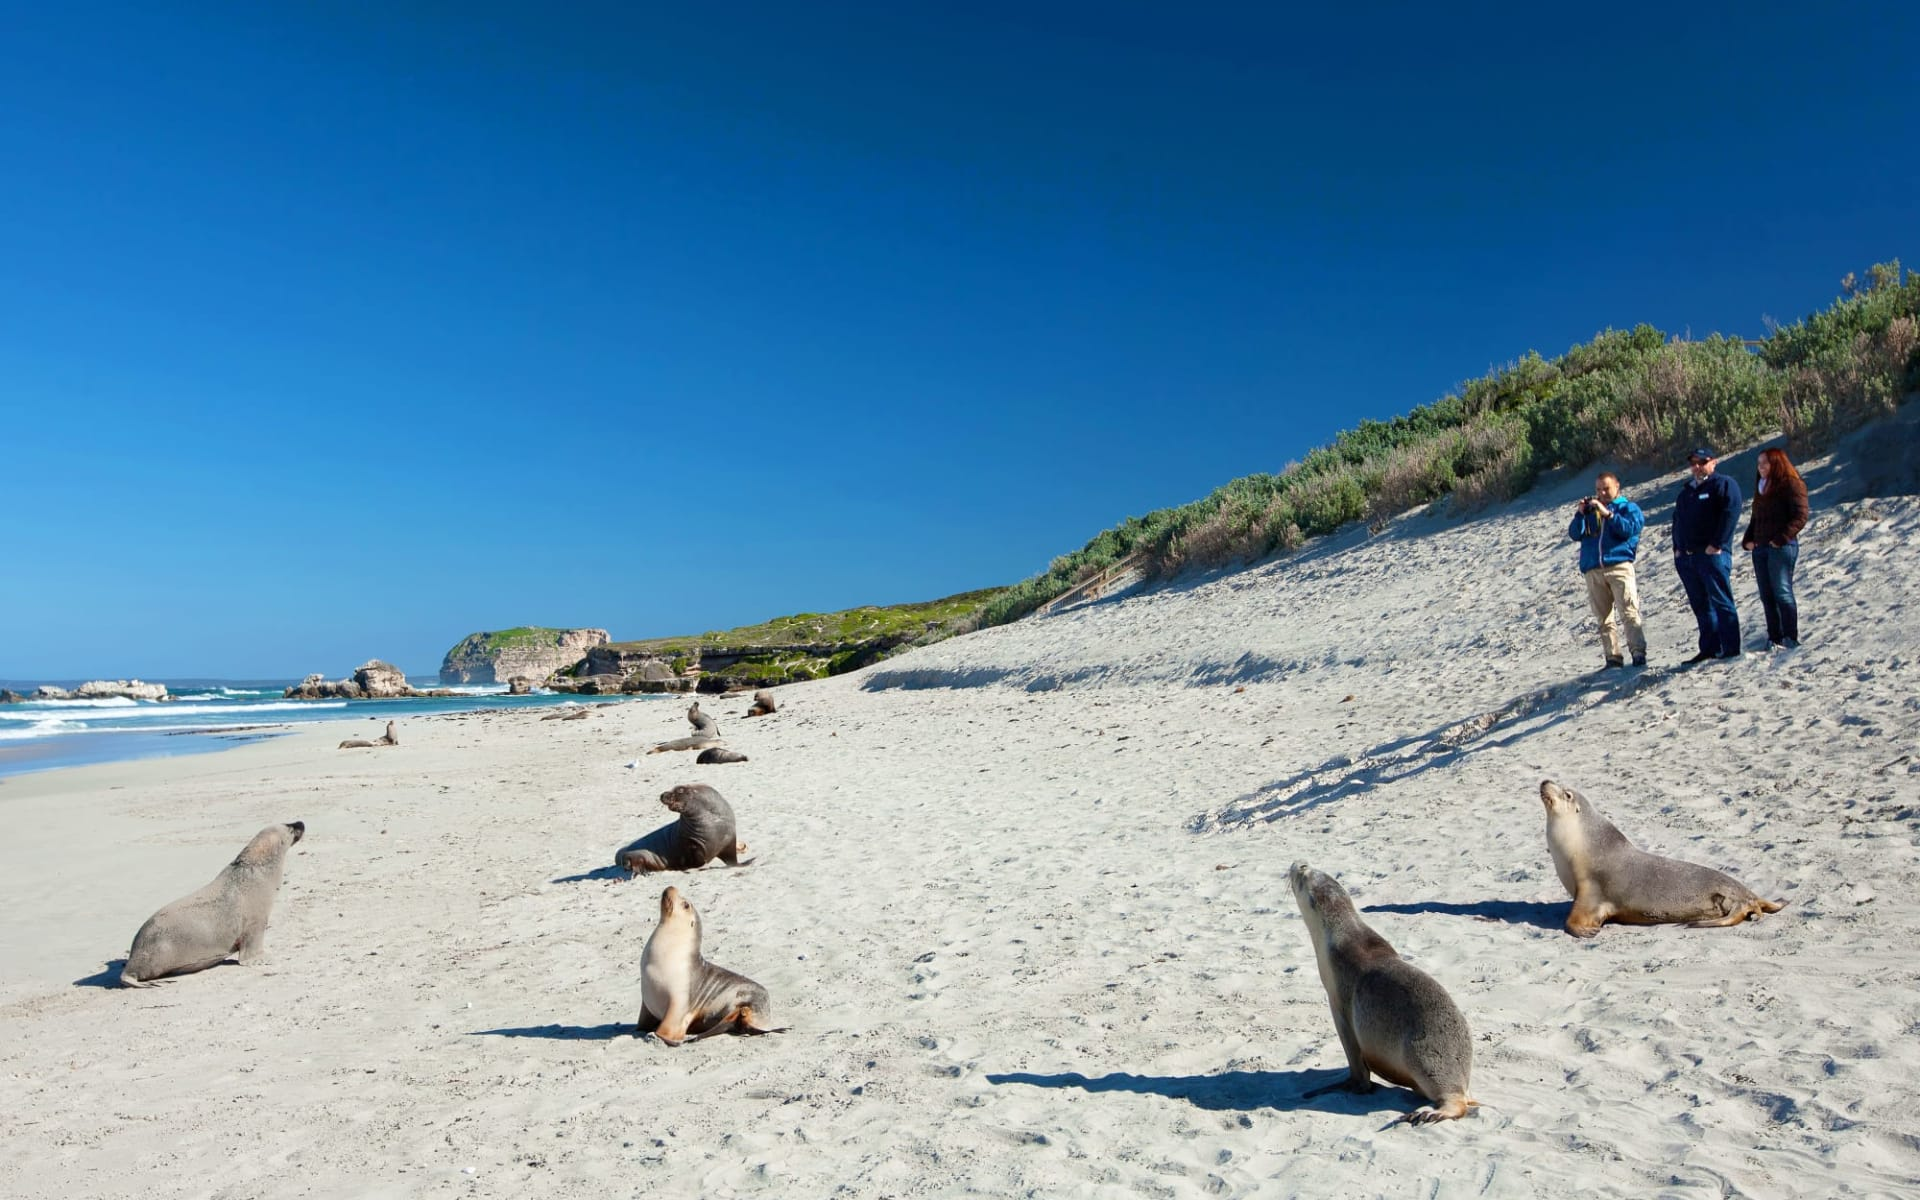 Nature Tour ab Adelaide: Seal Bay - Seehunde am Strand